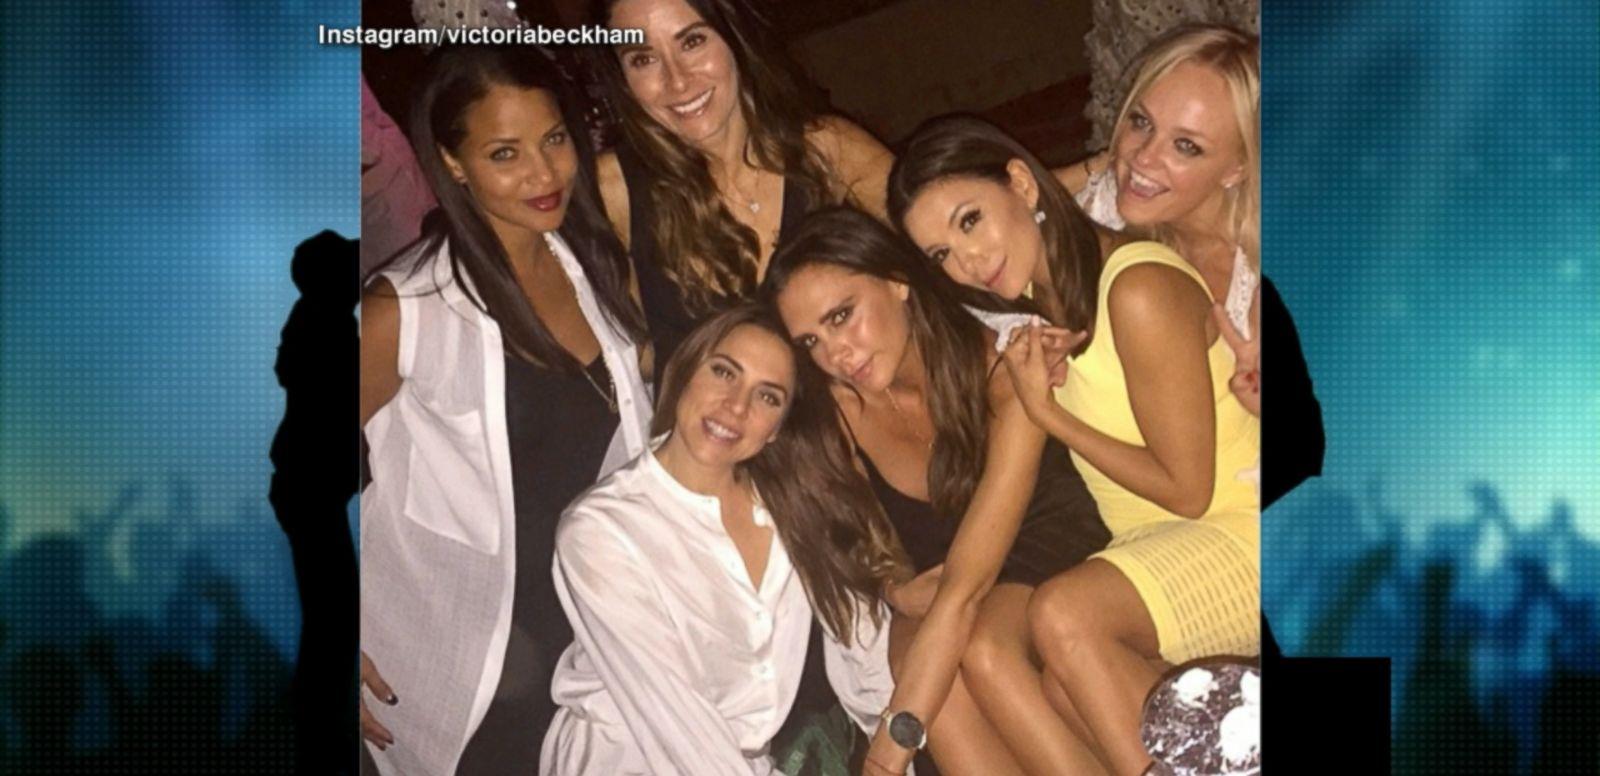 VIDEO: Actress Eva Longoria also joined the women for a celebration of Beckham's birthday milestone.